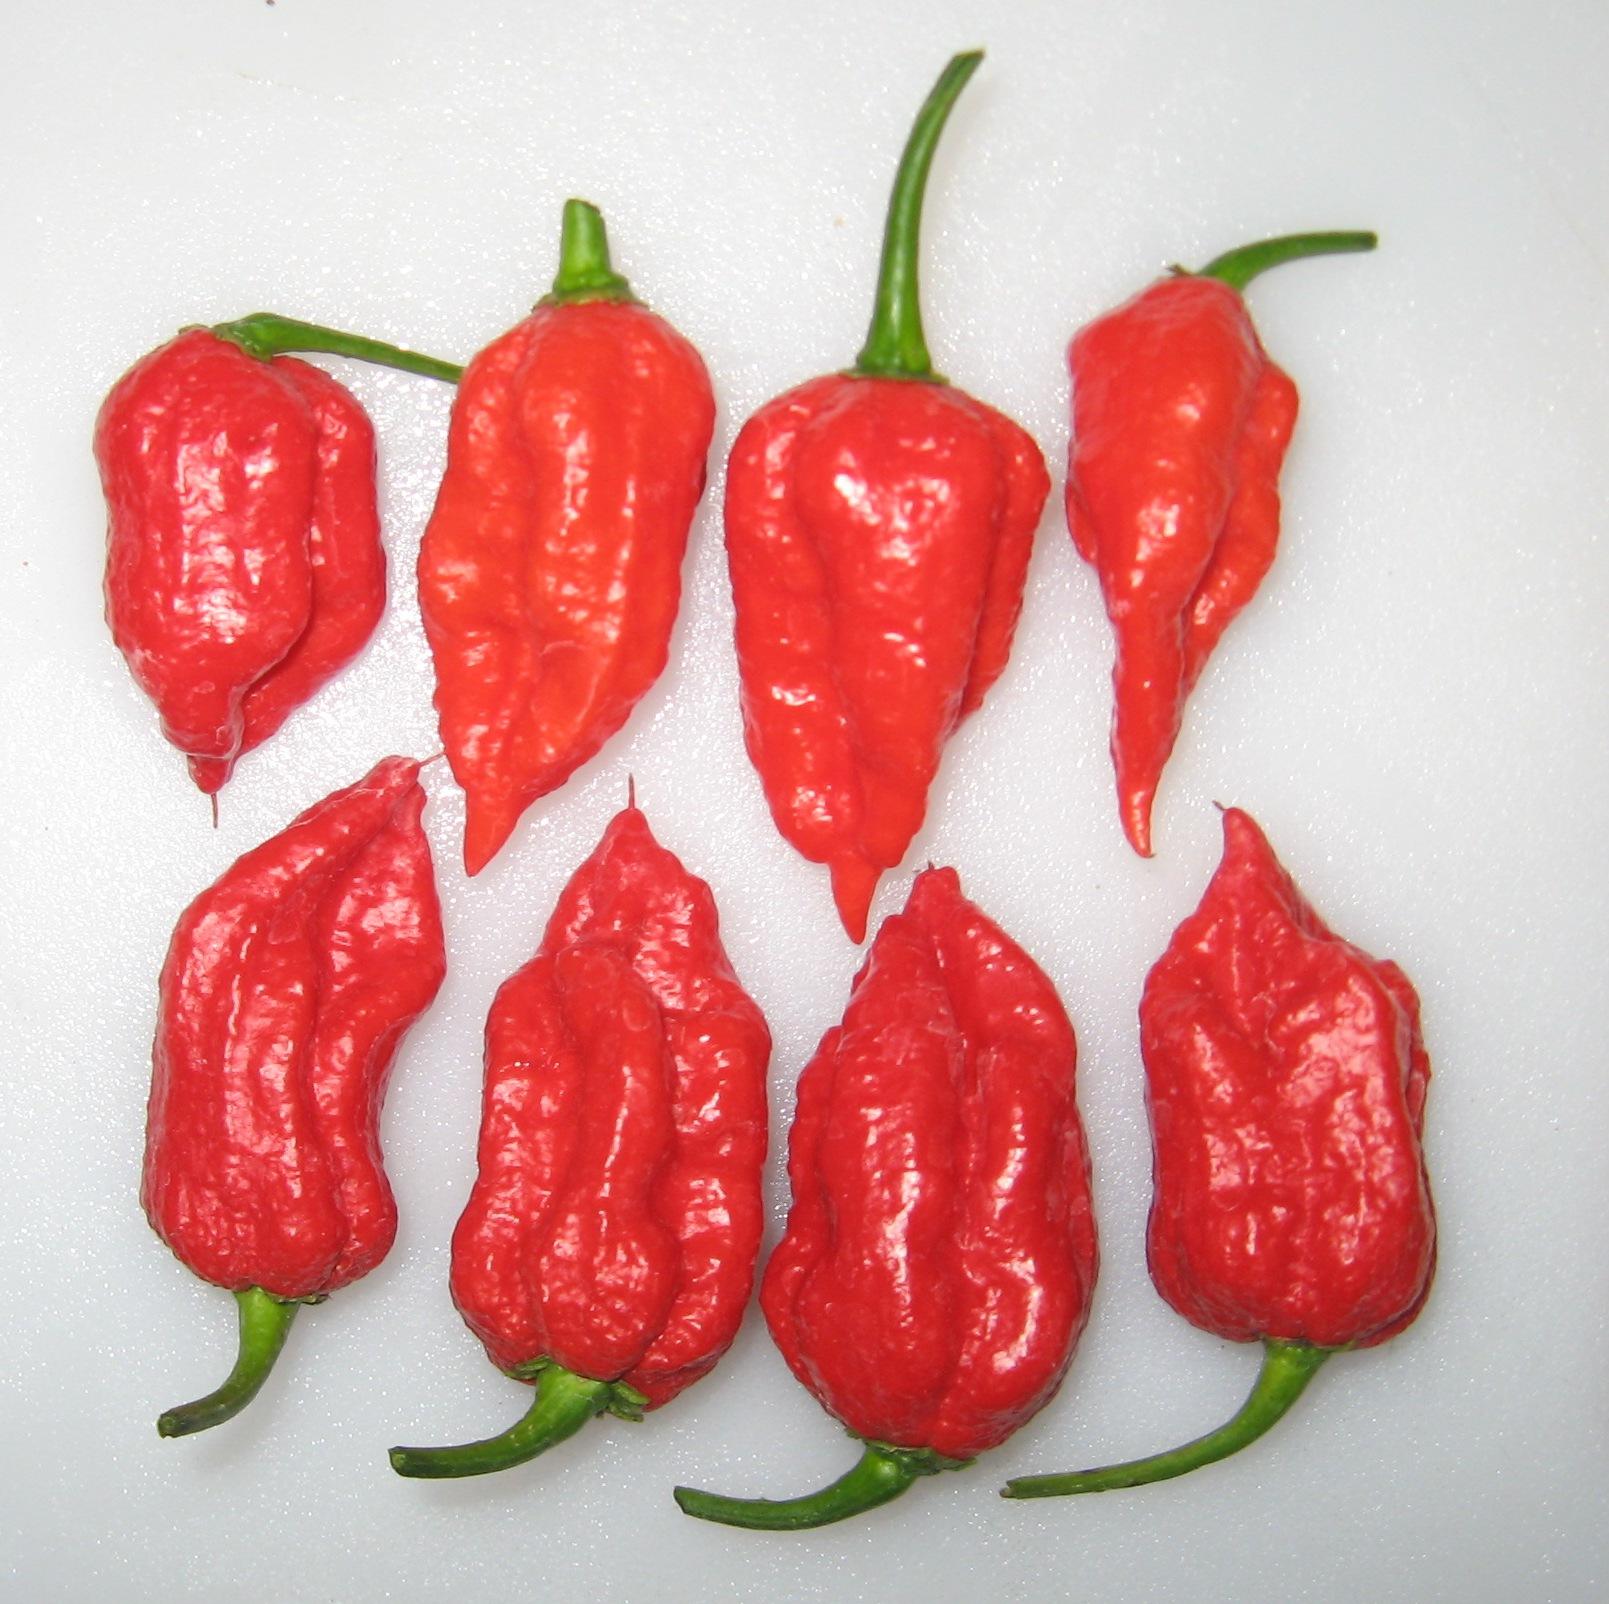 carolina reaper pepper harvest delectation of tomatoes etc